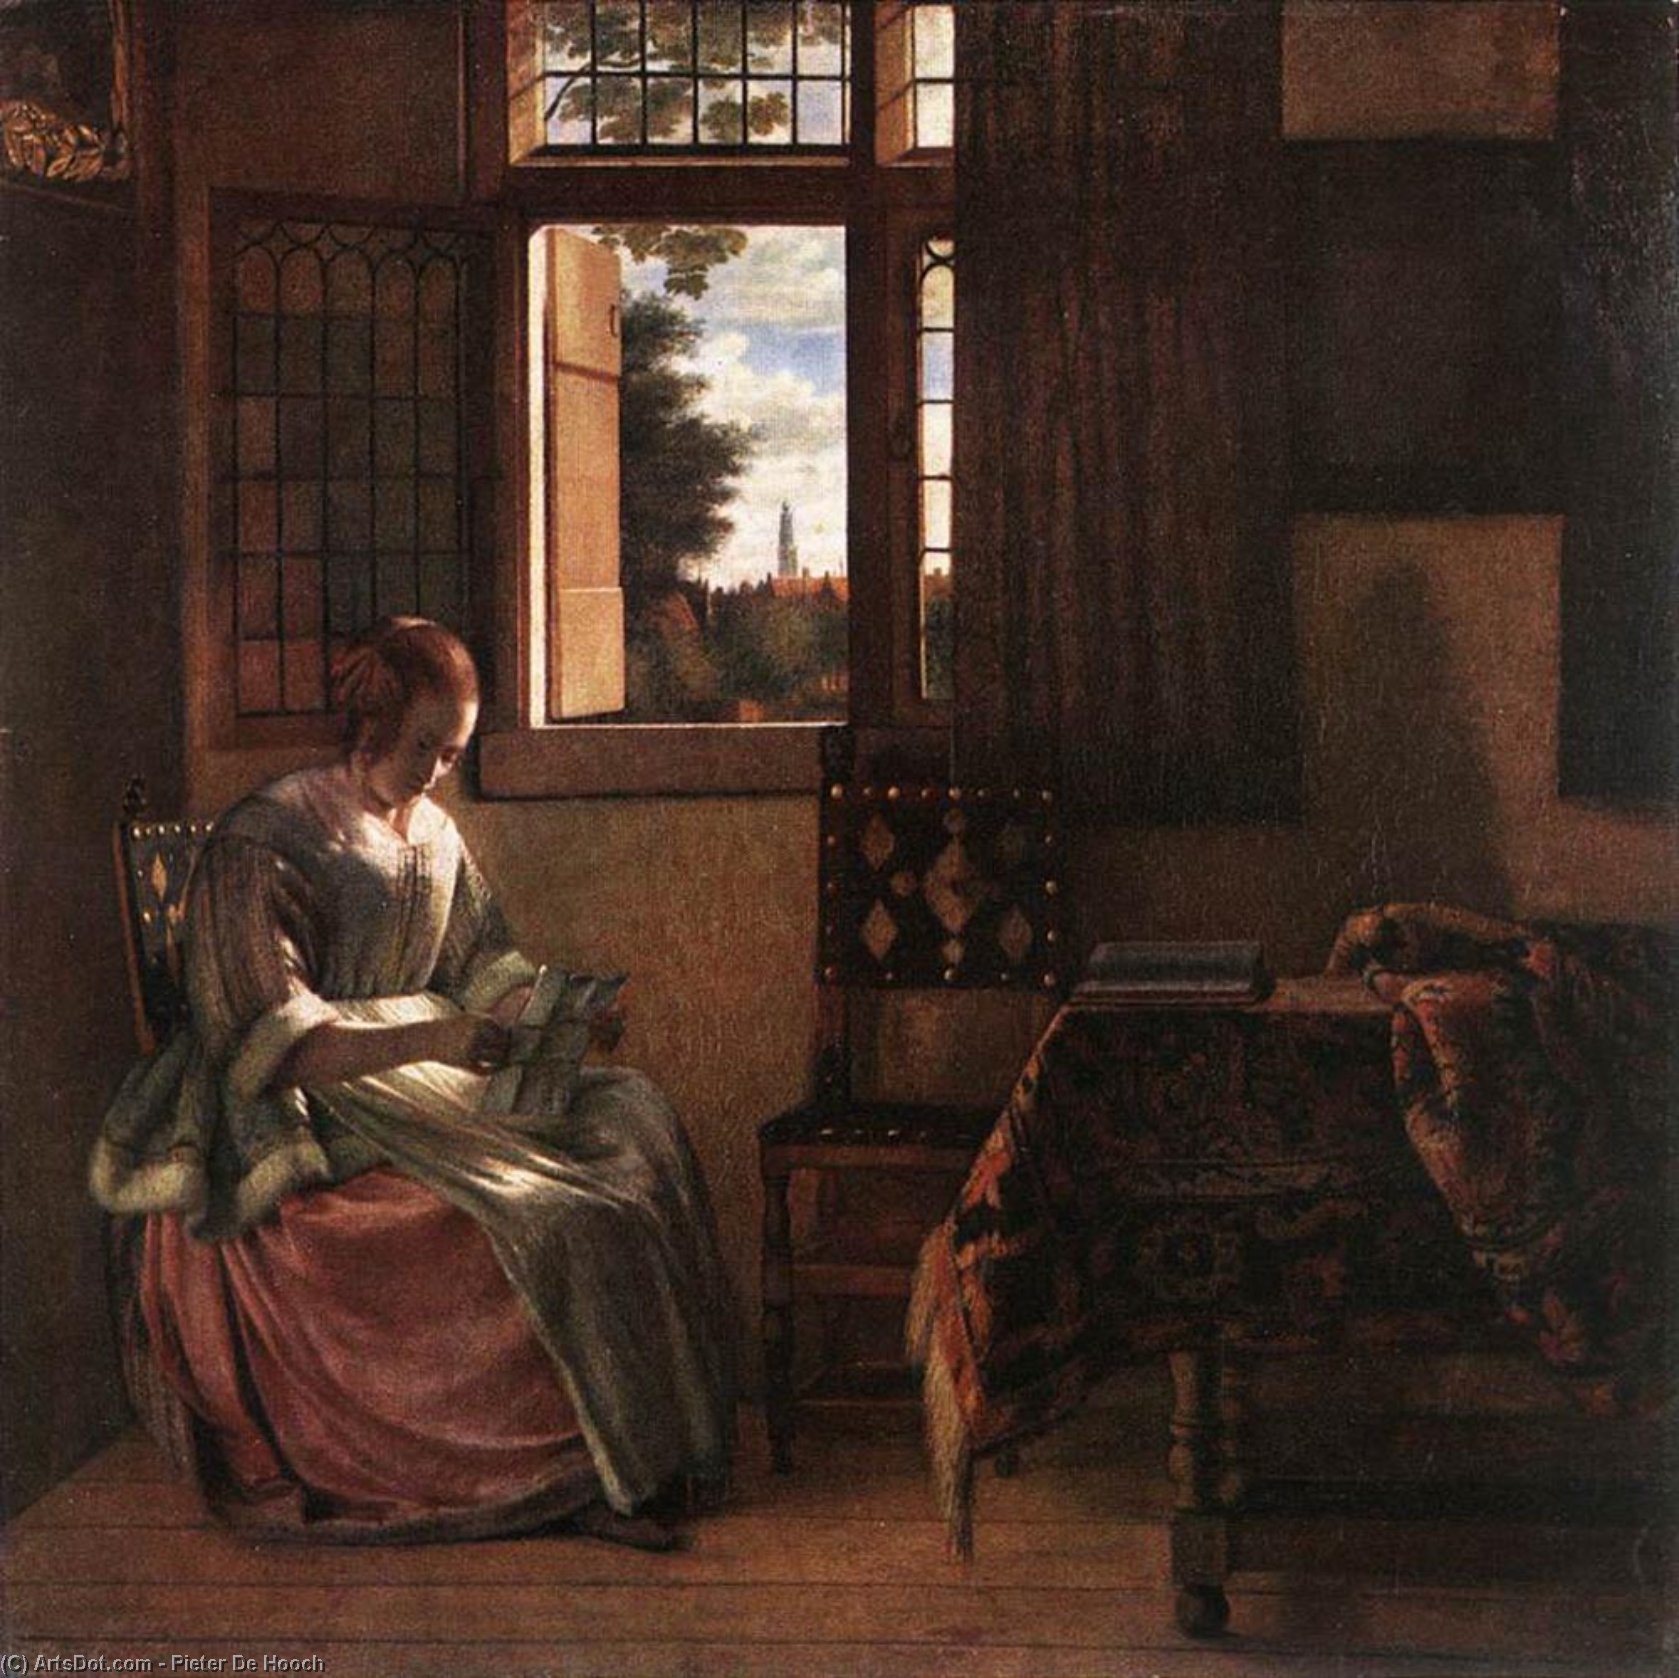 Wikioo.org - The Encyclopedia of Fine Arts - Painting, Artwork by Pieter De Hooch - Woman Reading a Letter